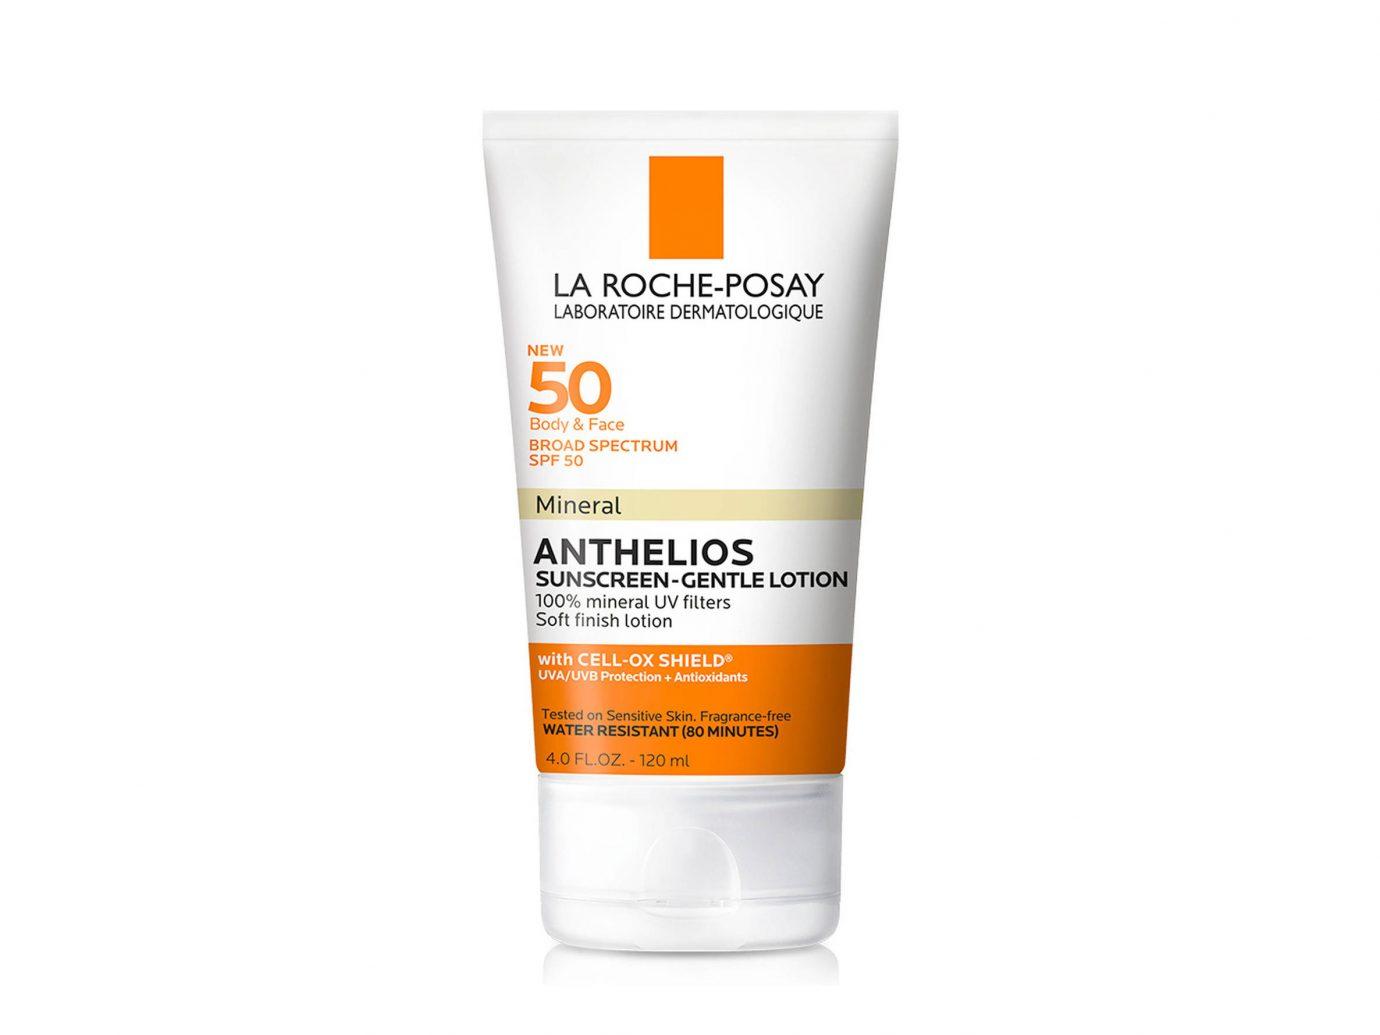 La Roche-Posay Anthelios SPF 50 Mineral Sunscreen